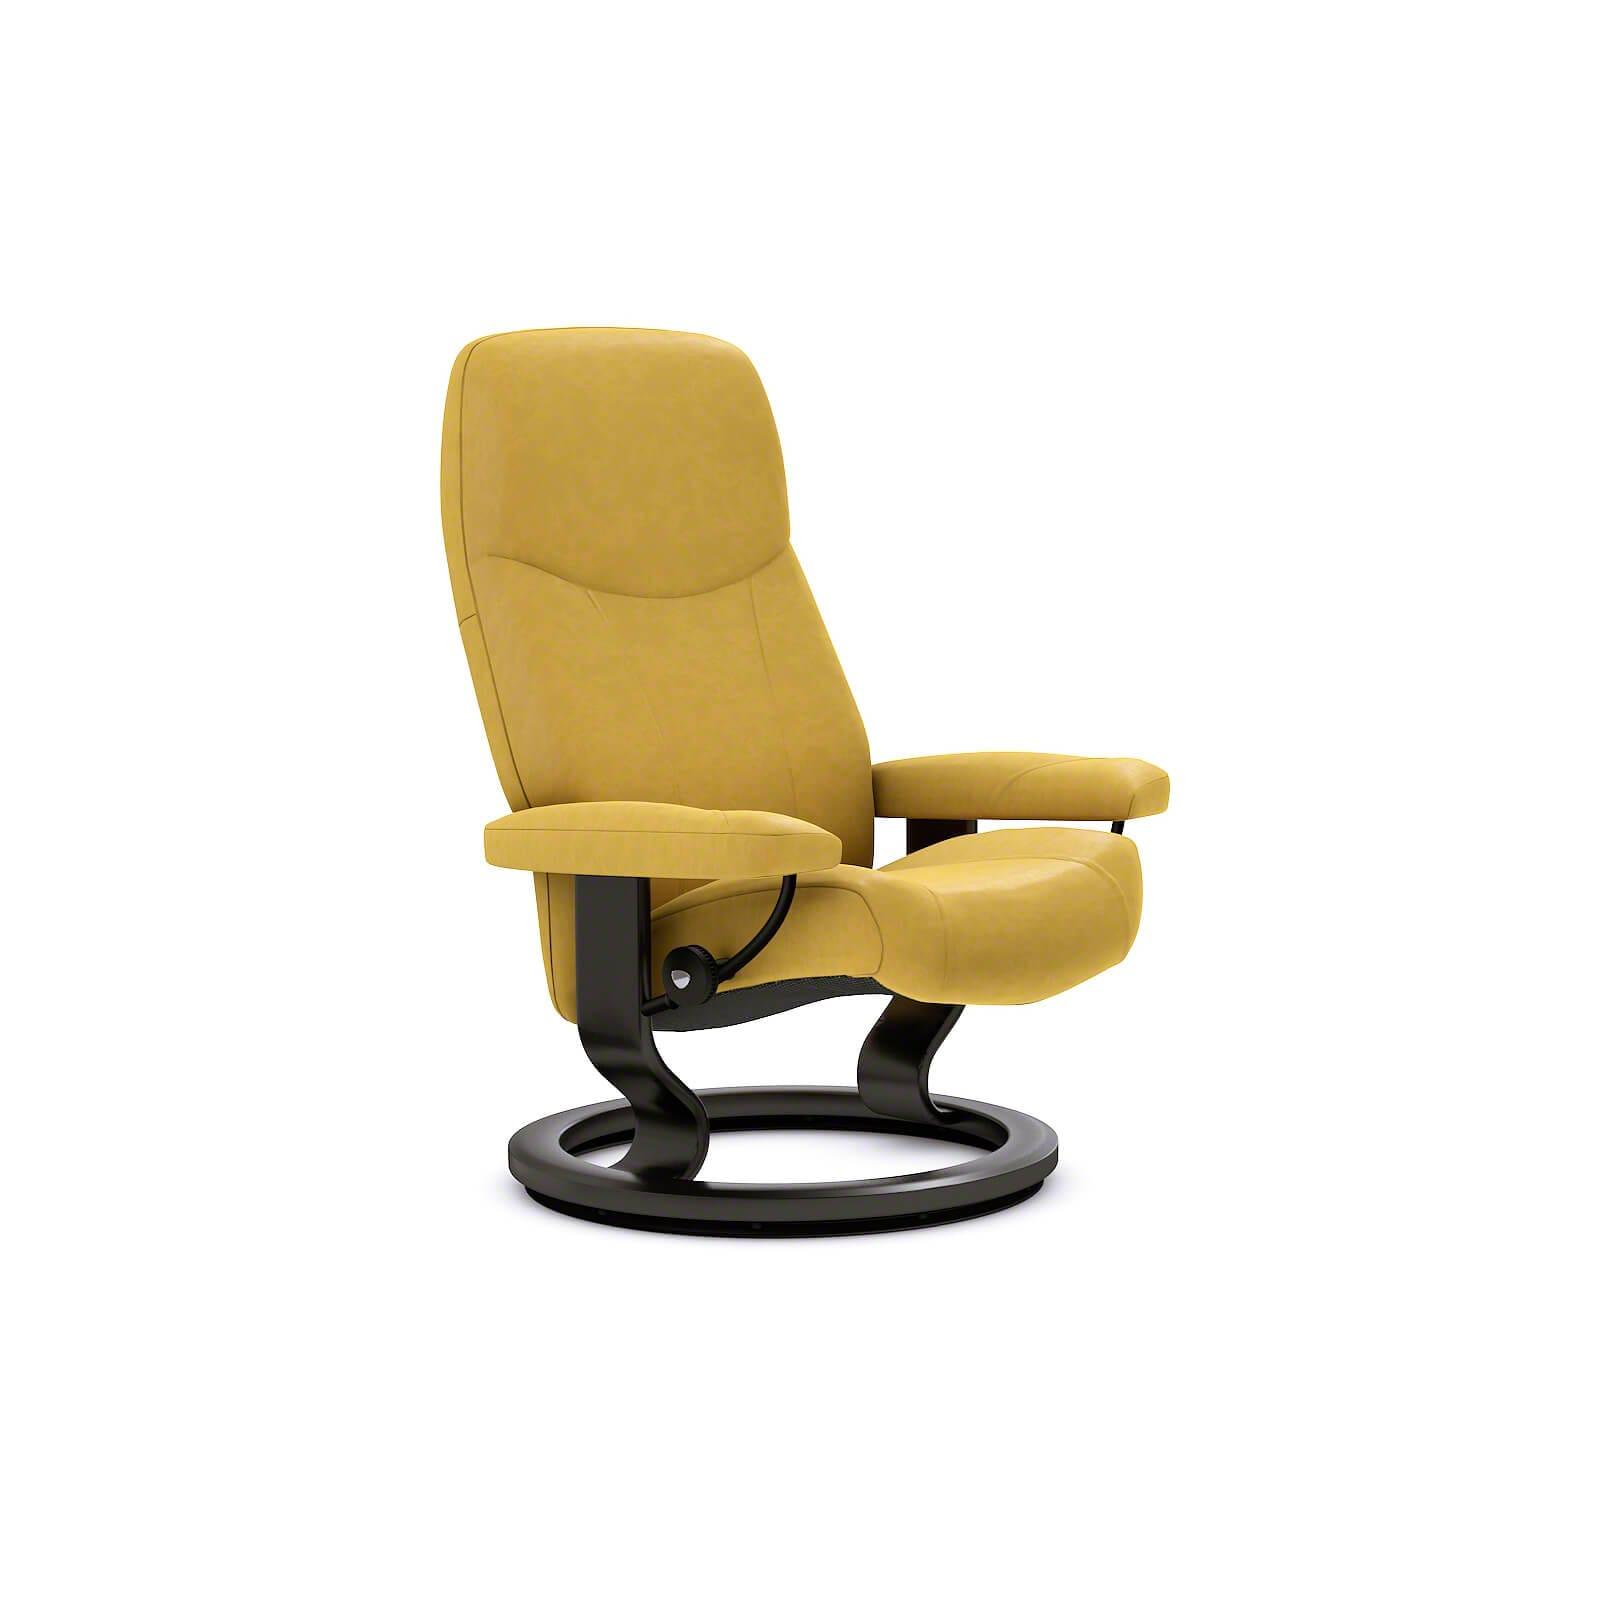 stressless consul sessel batick mimosa ohne hocker stressless. Black Bedroom Furniture Sets. Home Design Ideas